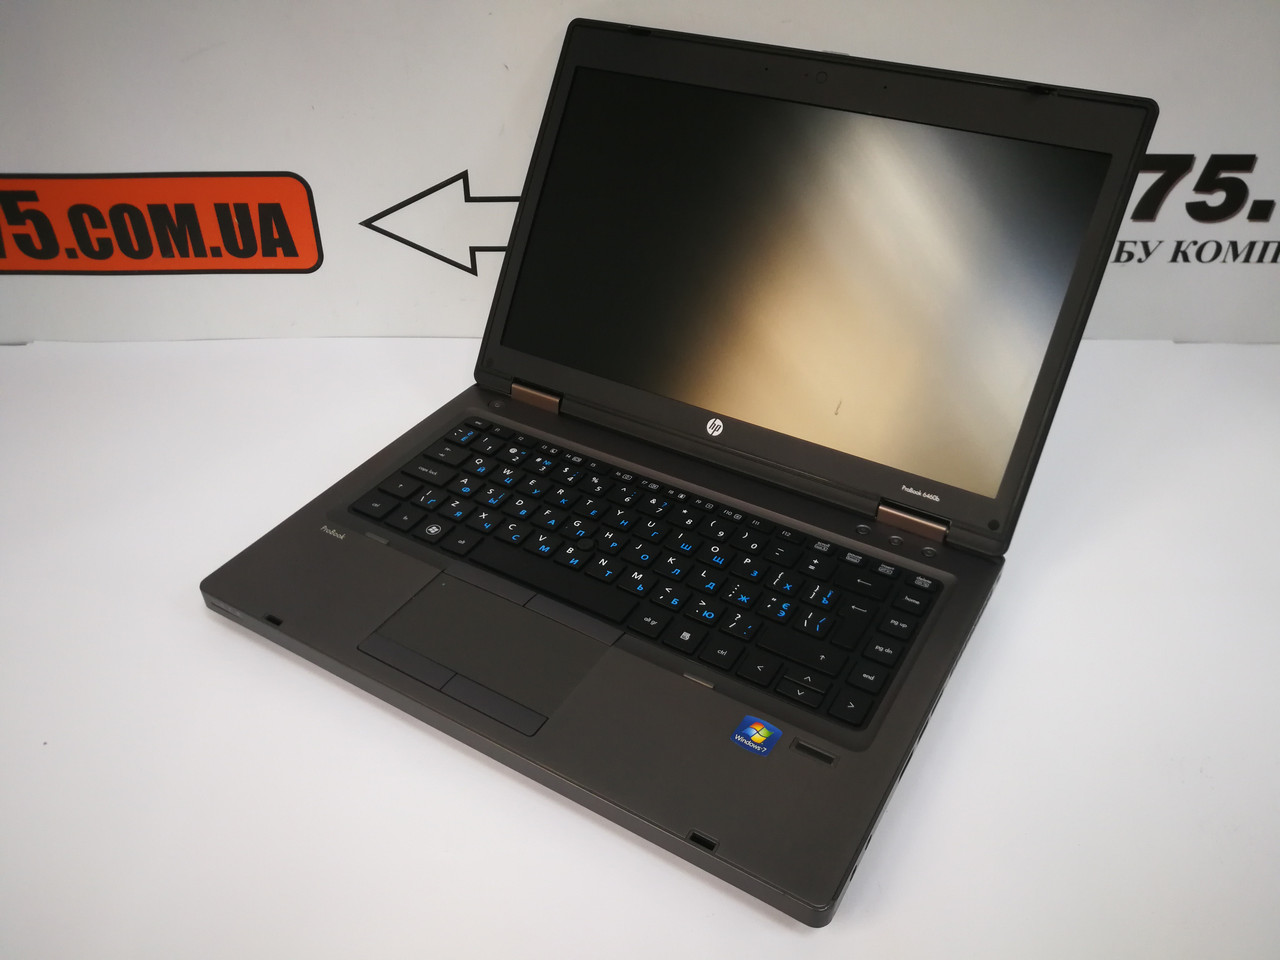 "Ноутбук HP ProBook 6460b, 14"", Intel Core i5-2520M 3.2GHz, RAM 4ГБ, HDD 320ГБ"